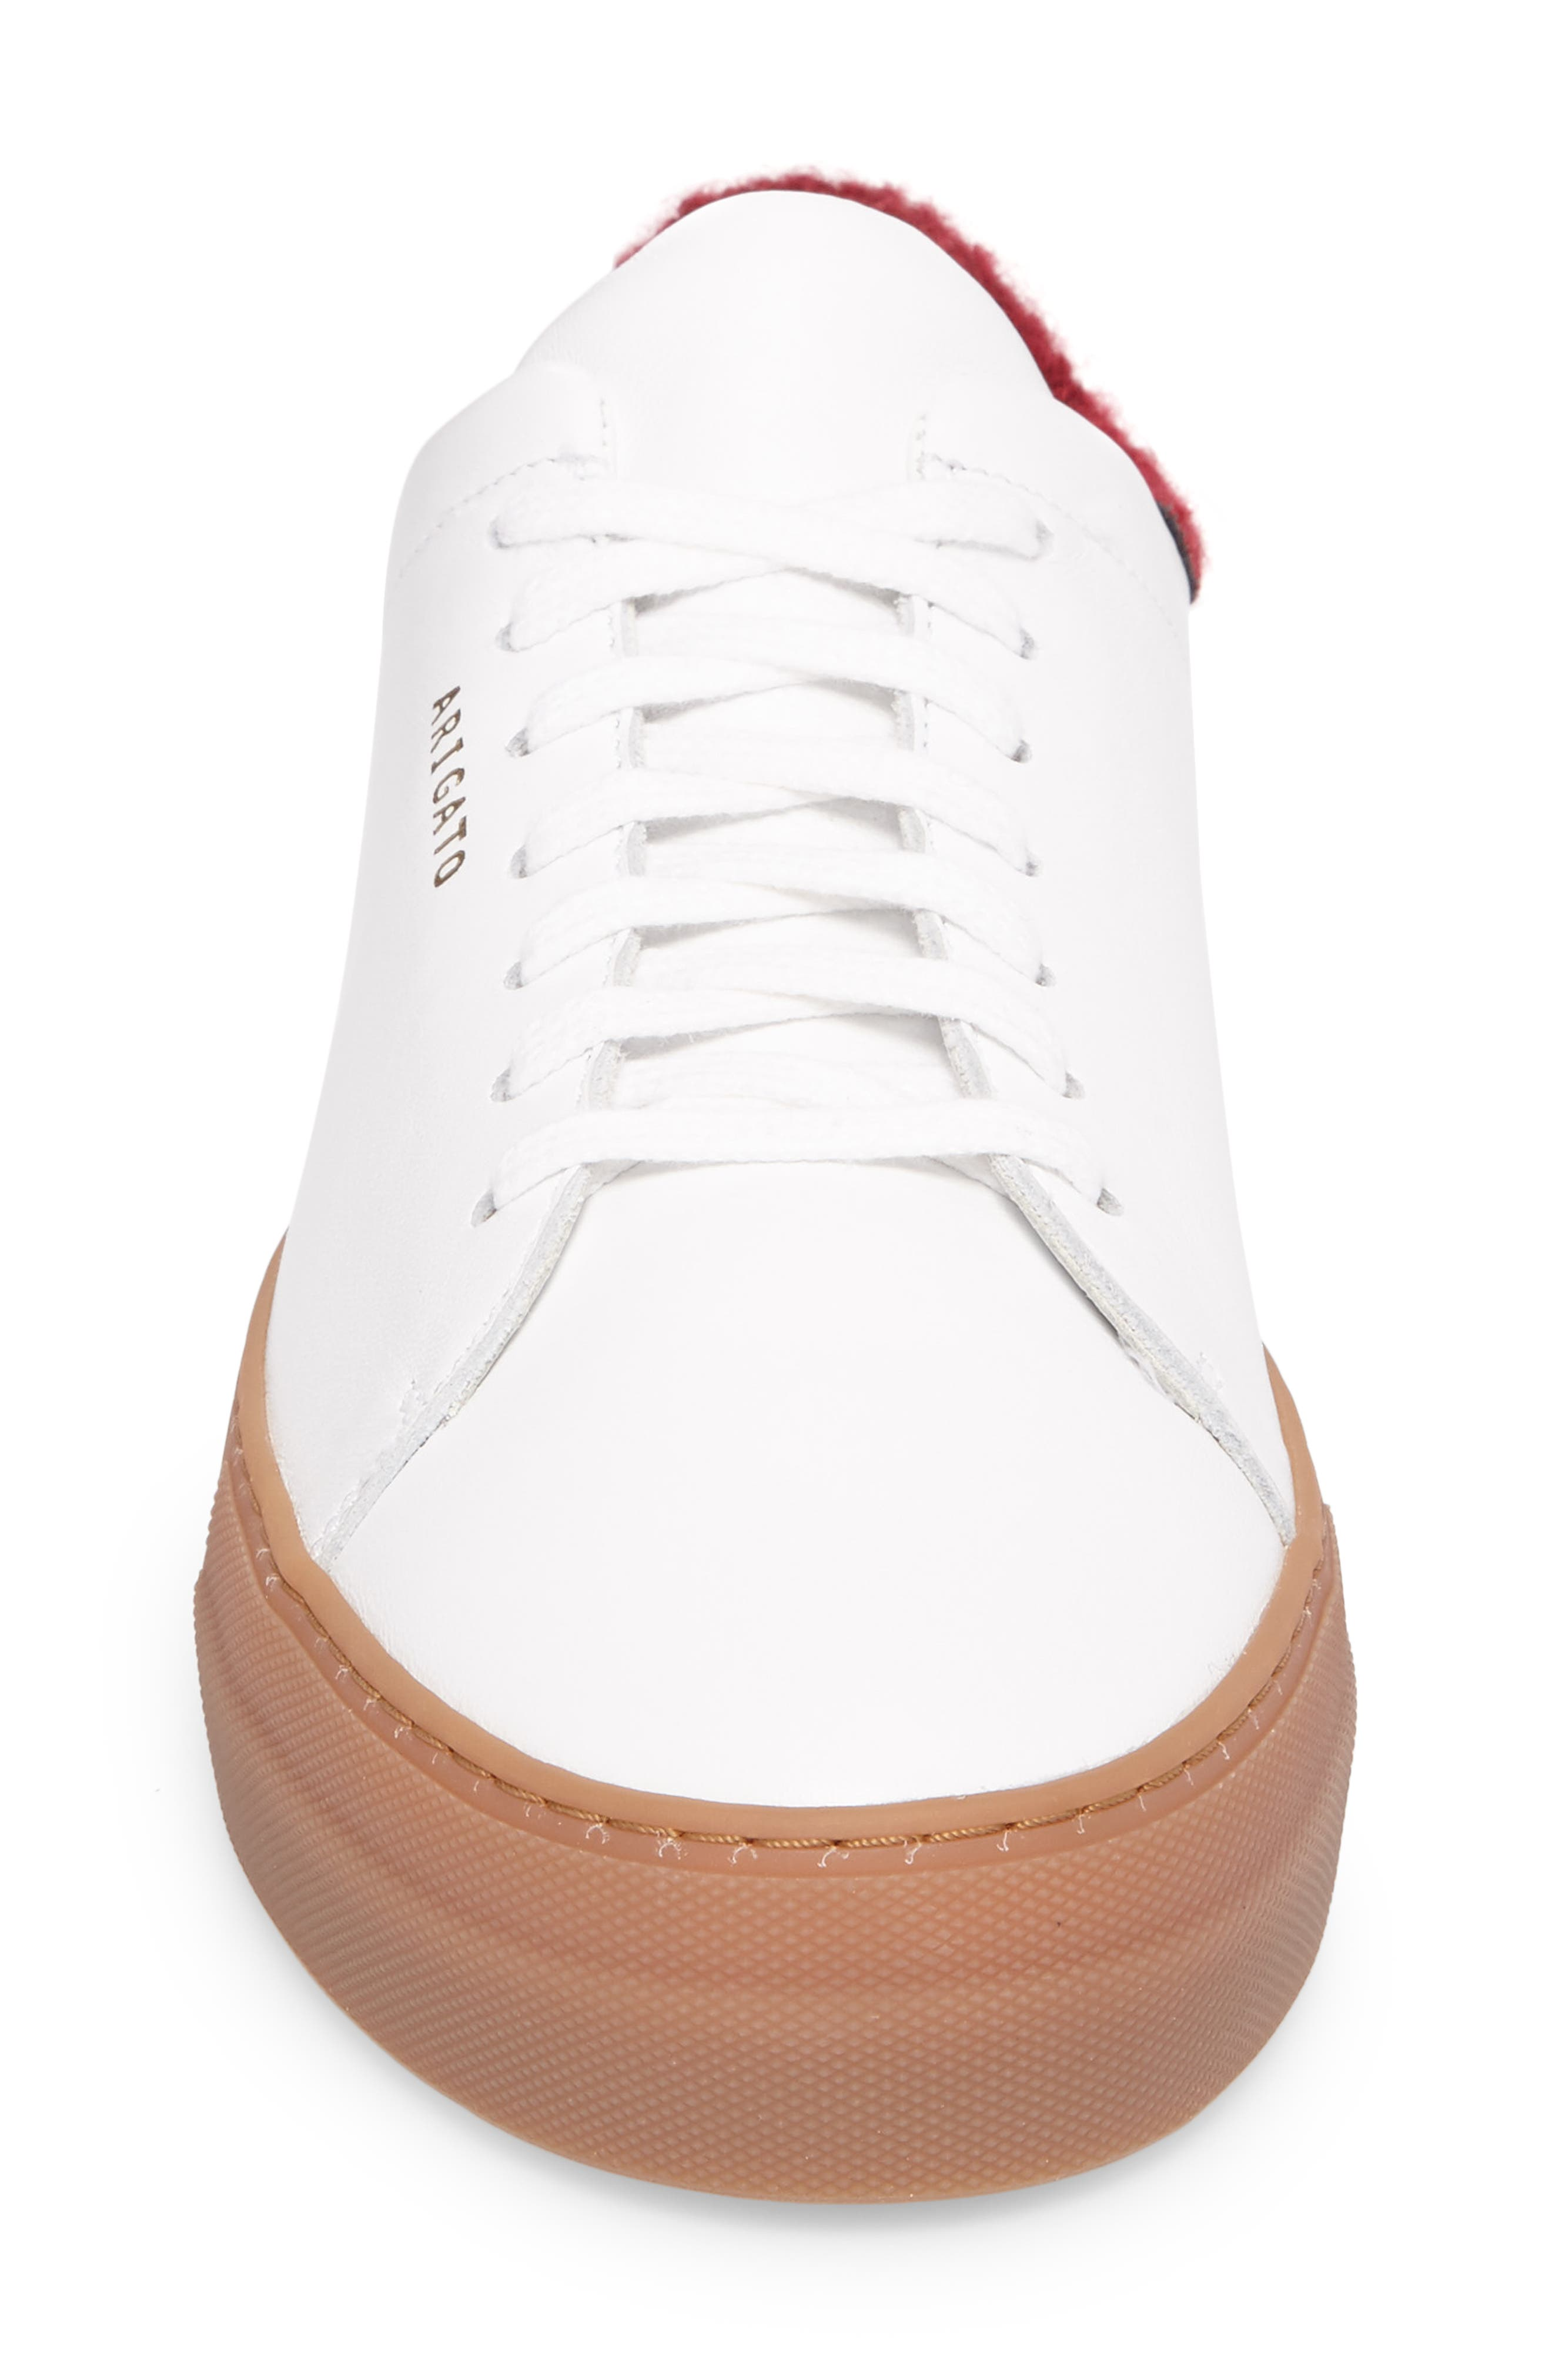 Clean 360 Fuzzy Heel Sneaker,                             Alternate thumbnail 4, color,                             White